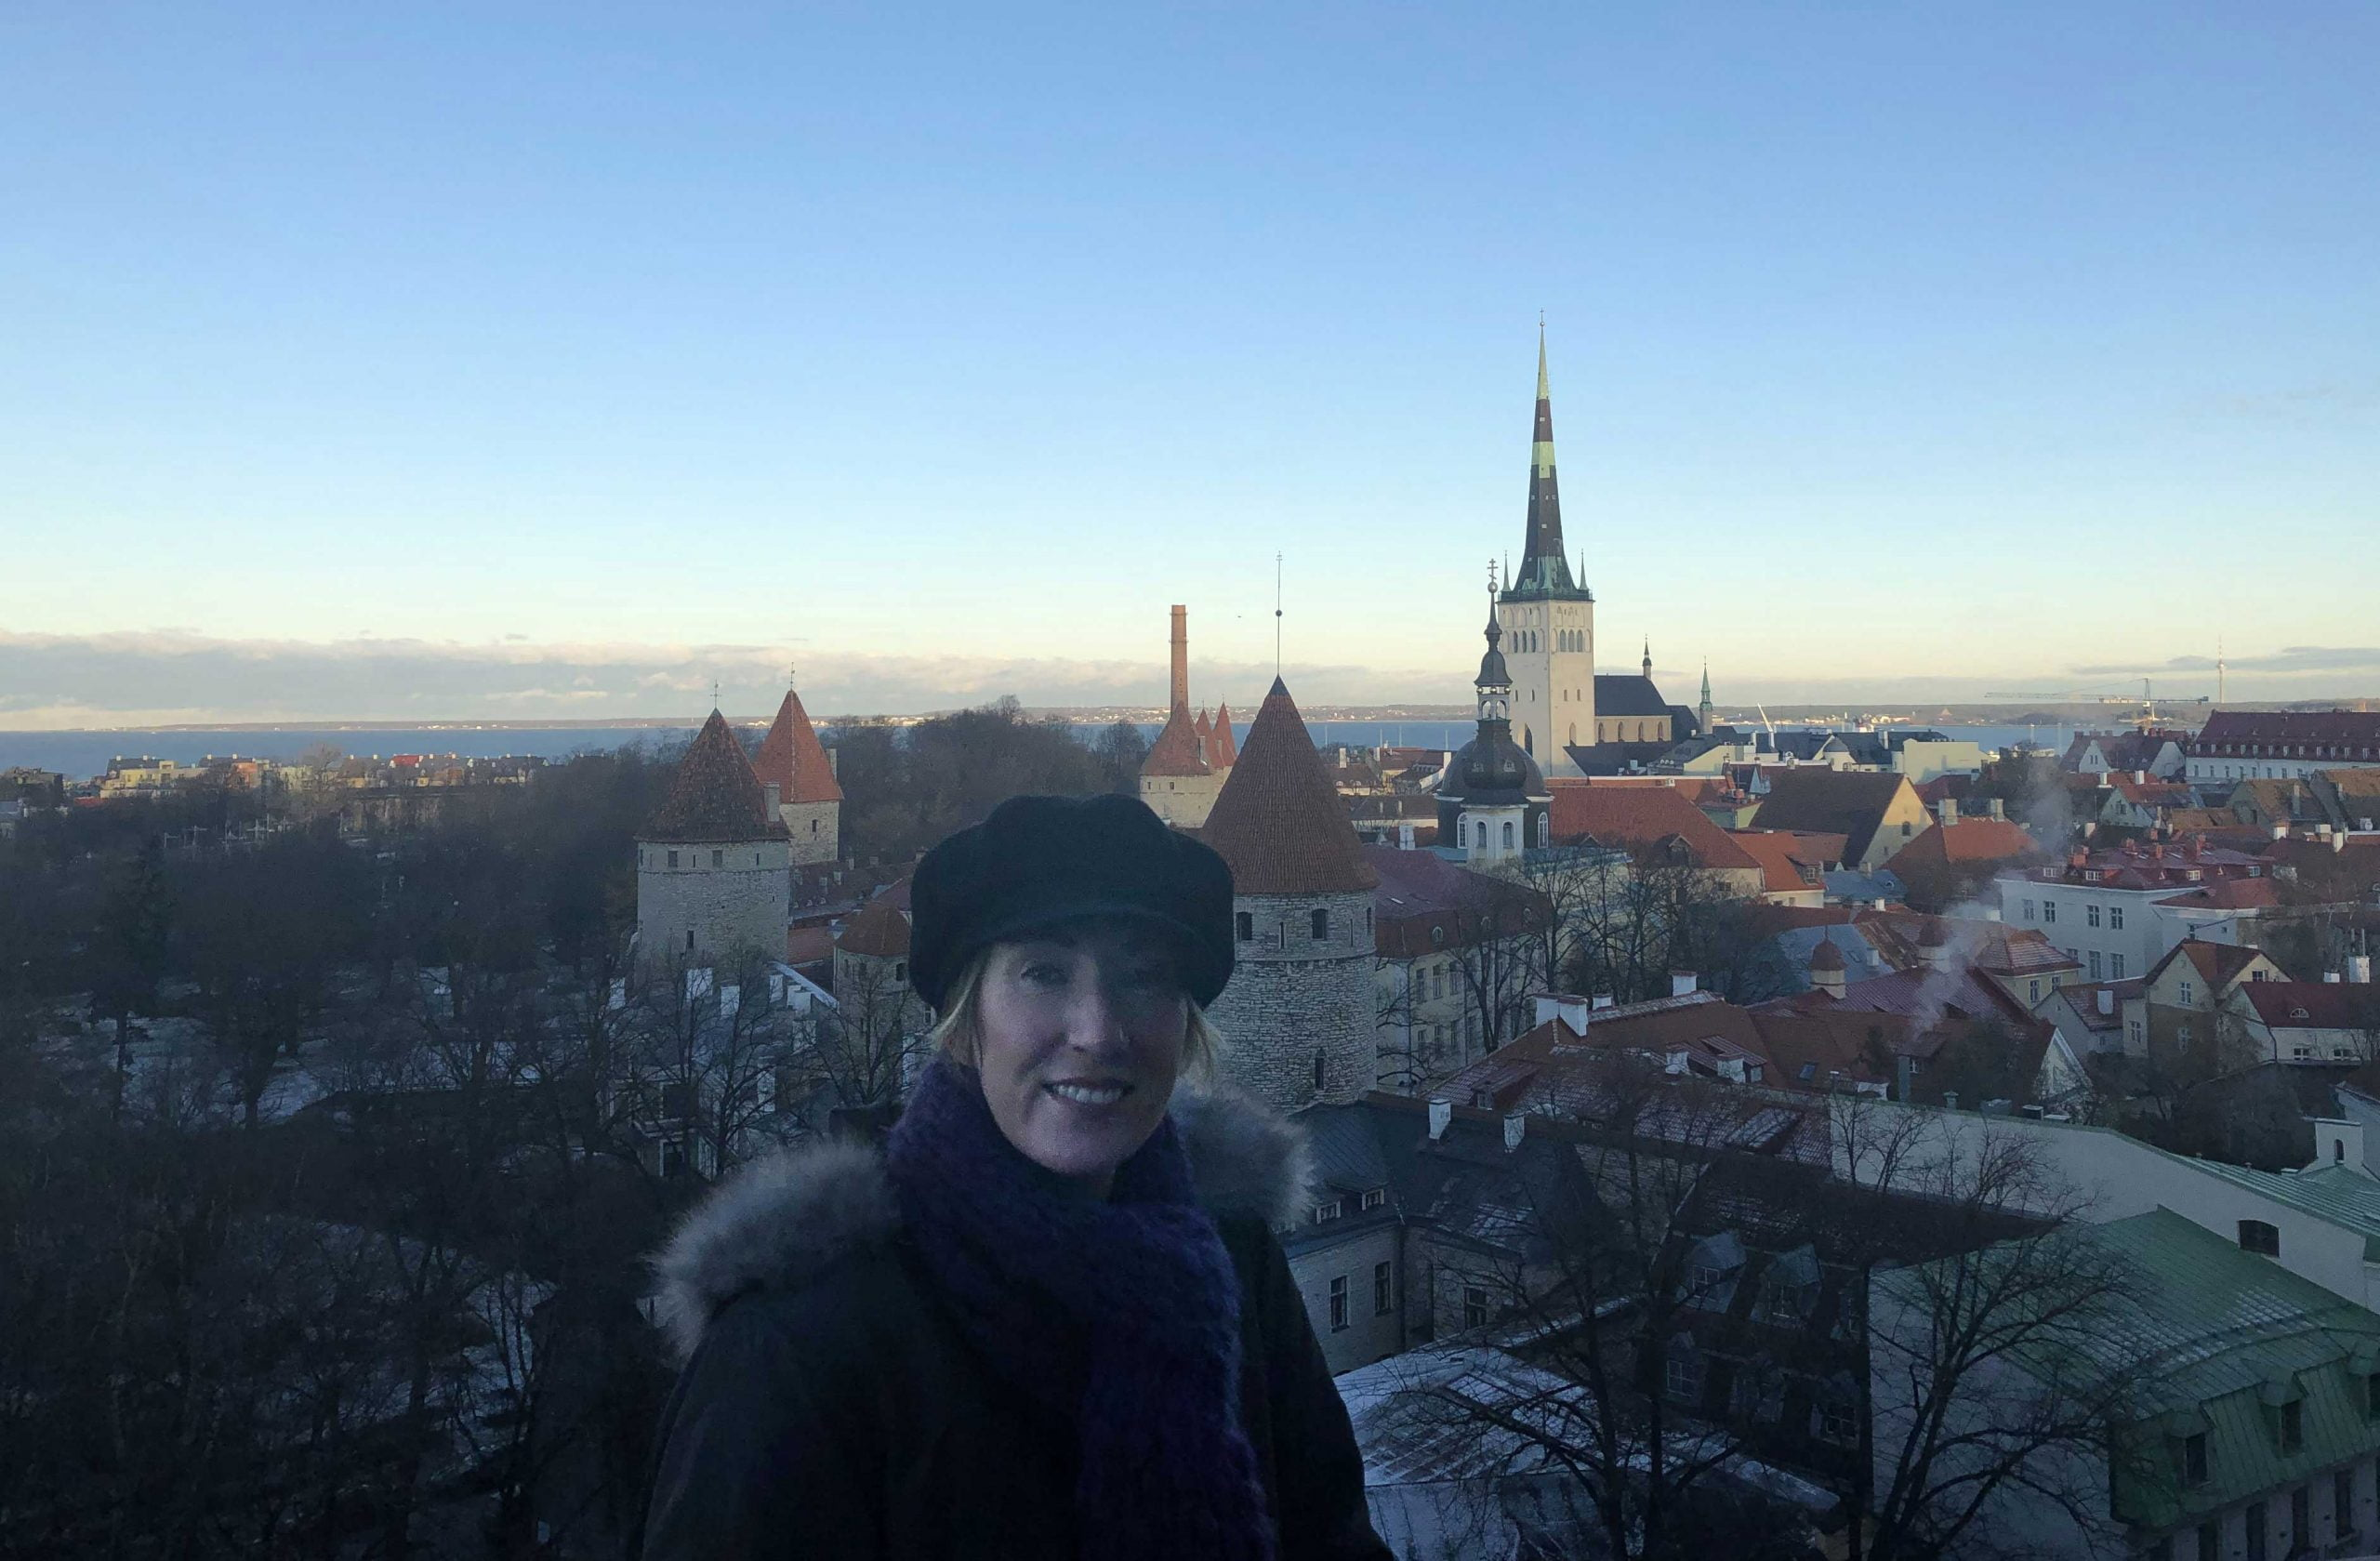 SWWW, Top 15 Things To Do In Tallinn Old Town, Estonia